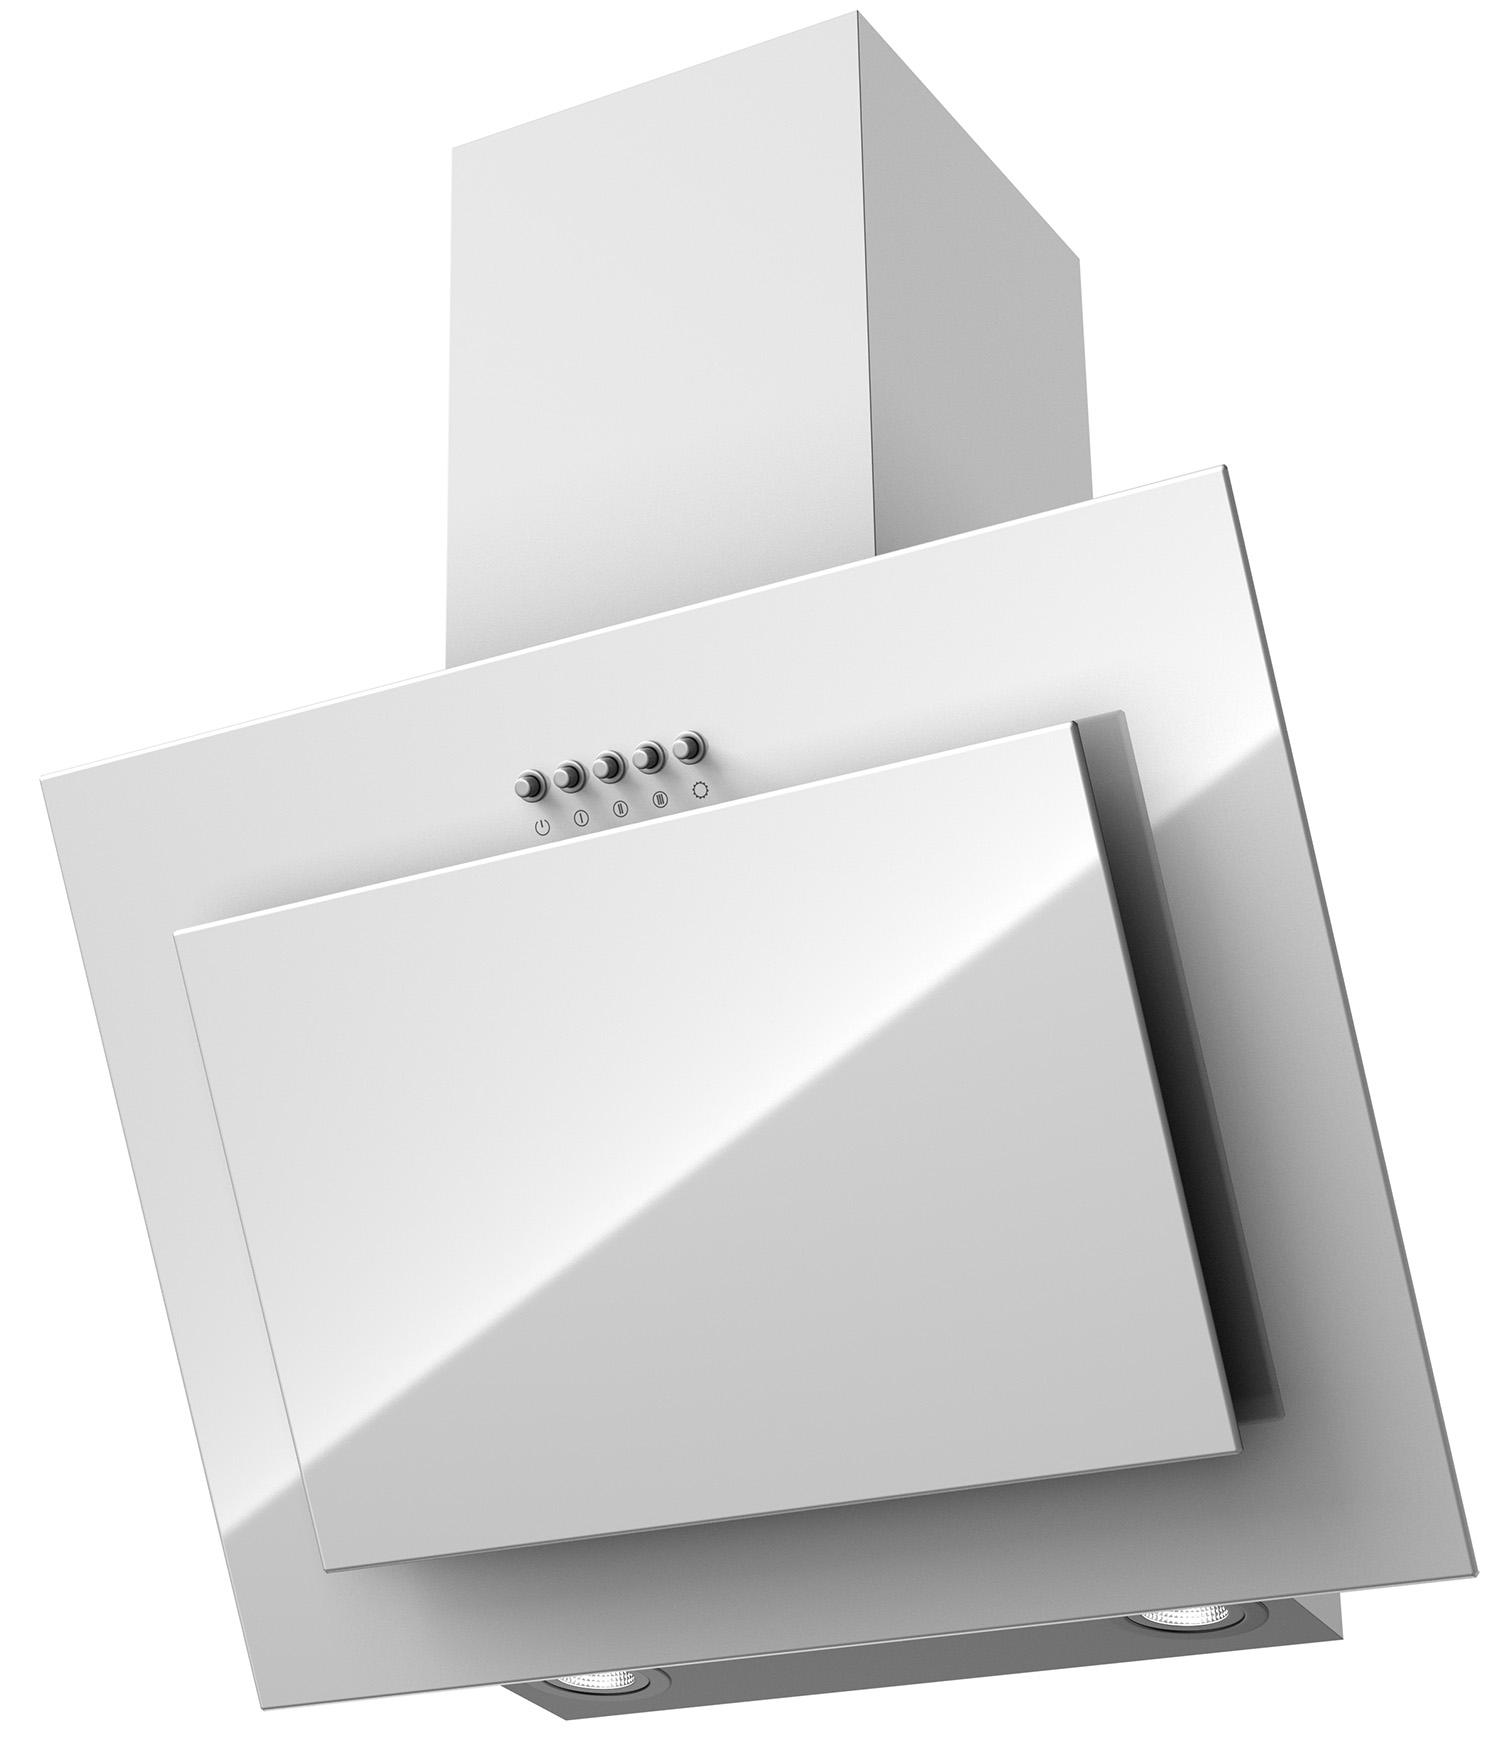 SELIYA 600 white push button, стоимость 13 104 руб.